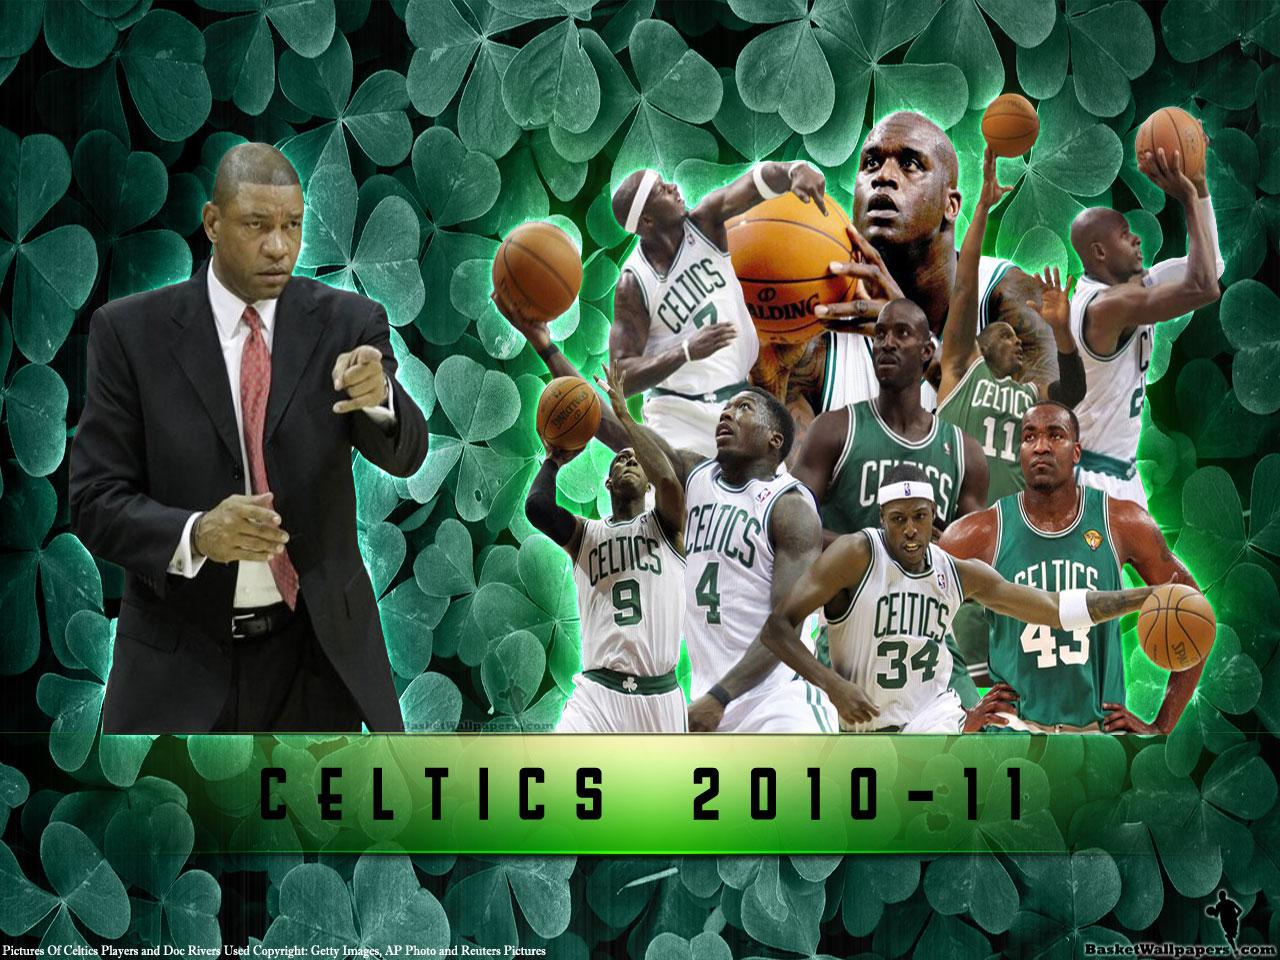 11 Season Wallpaper Basketball Wallpapers at BasketWallpaperscom 1280x960